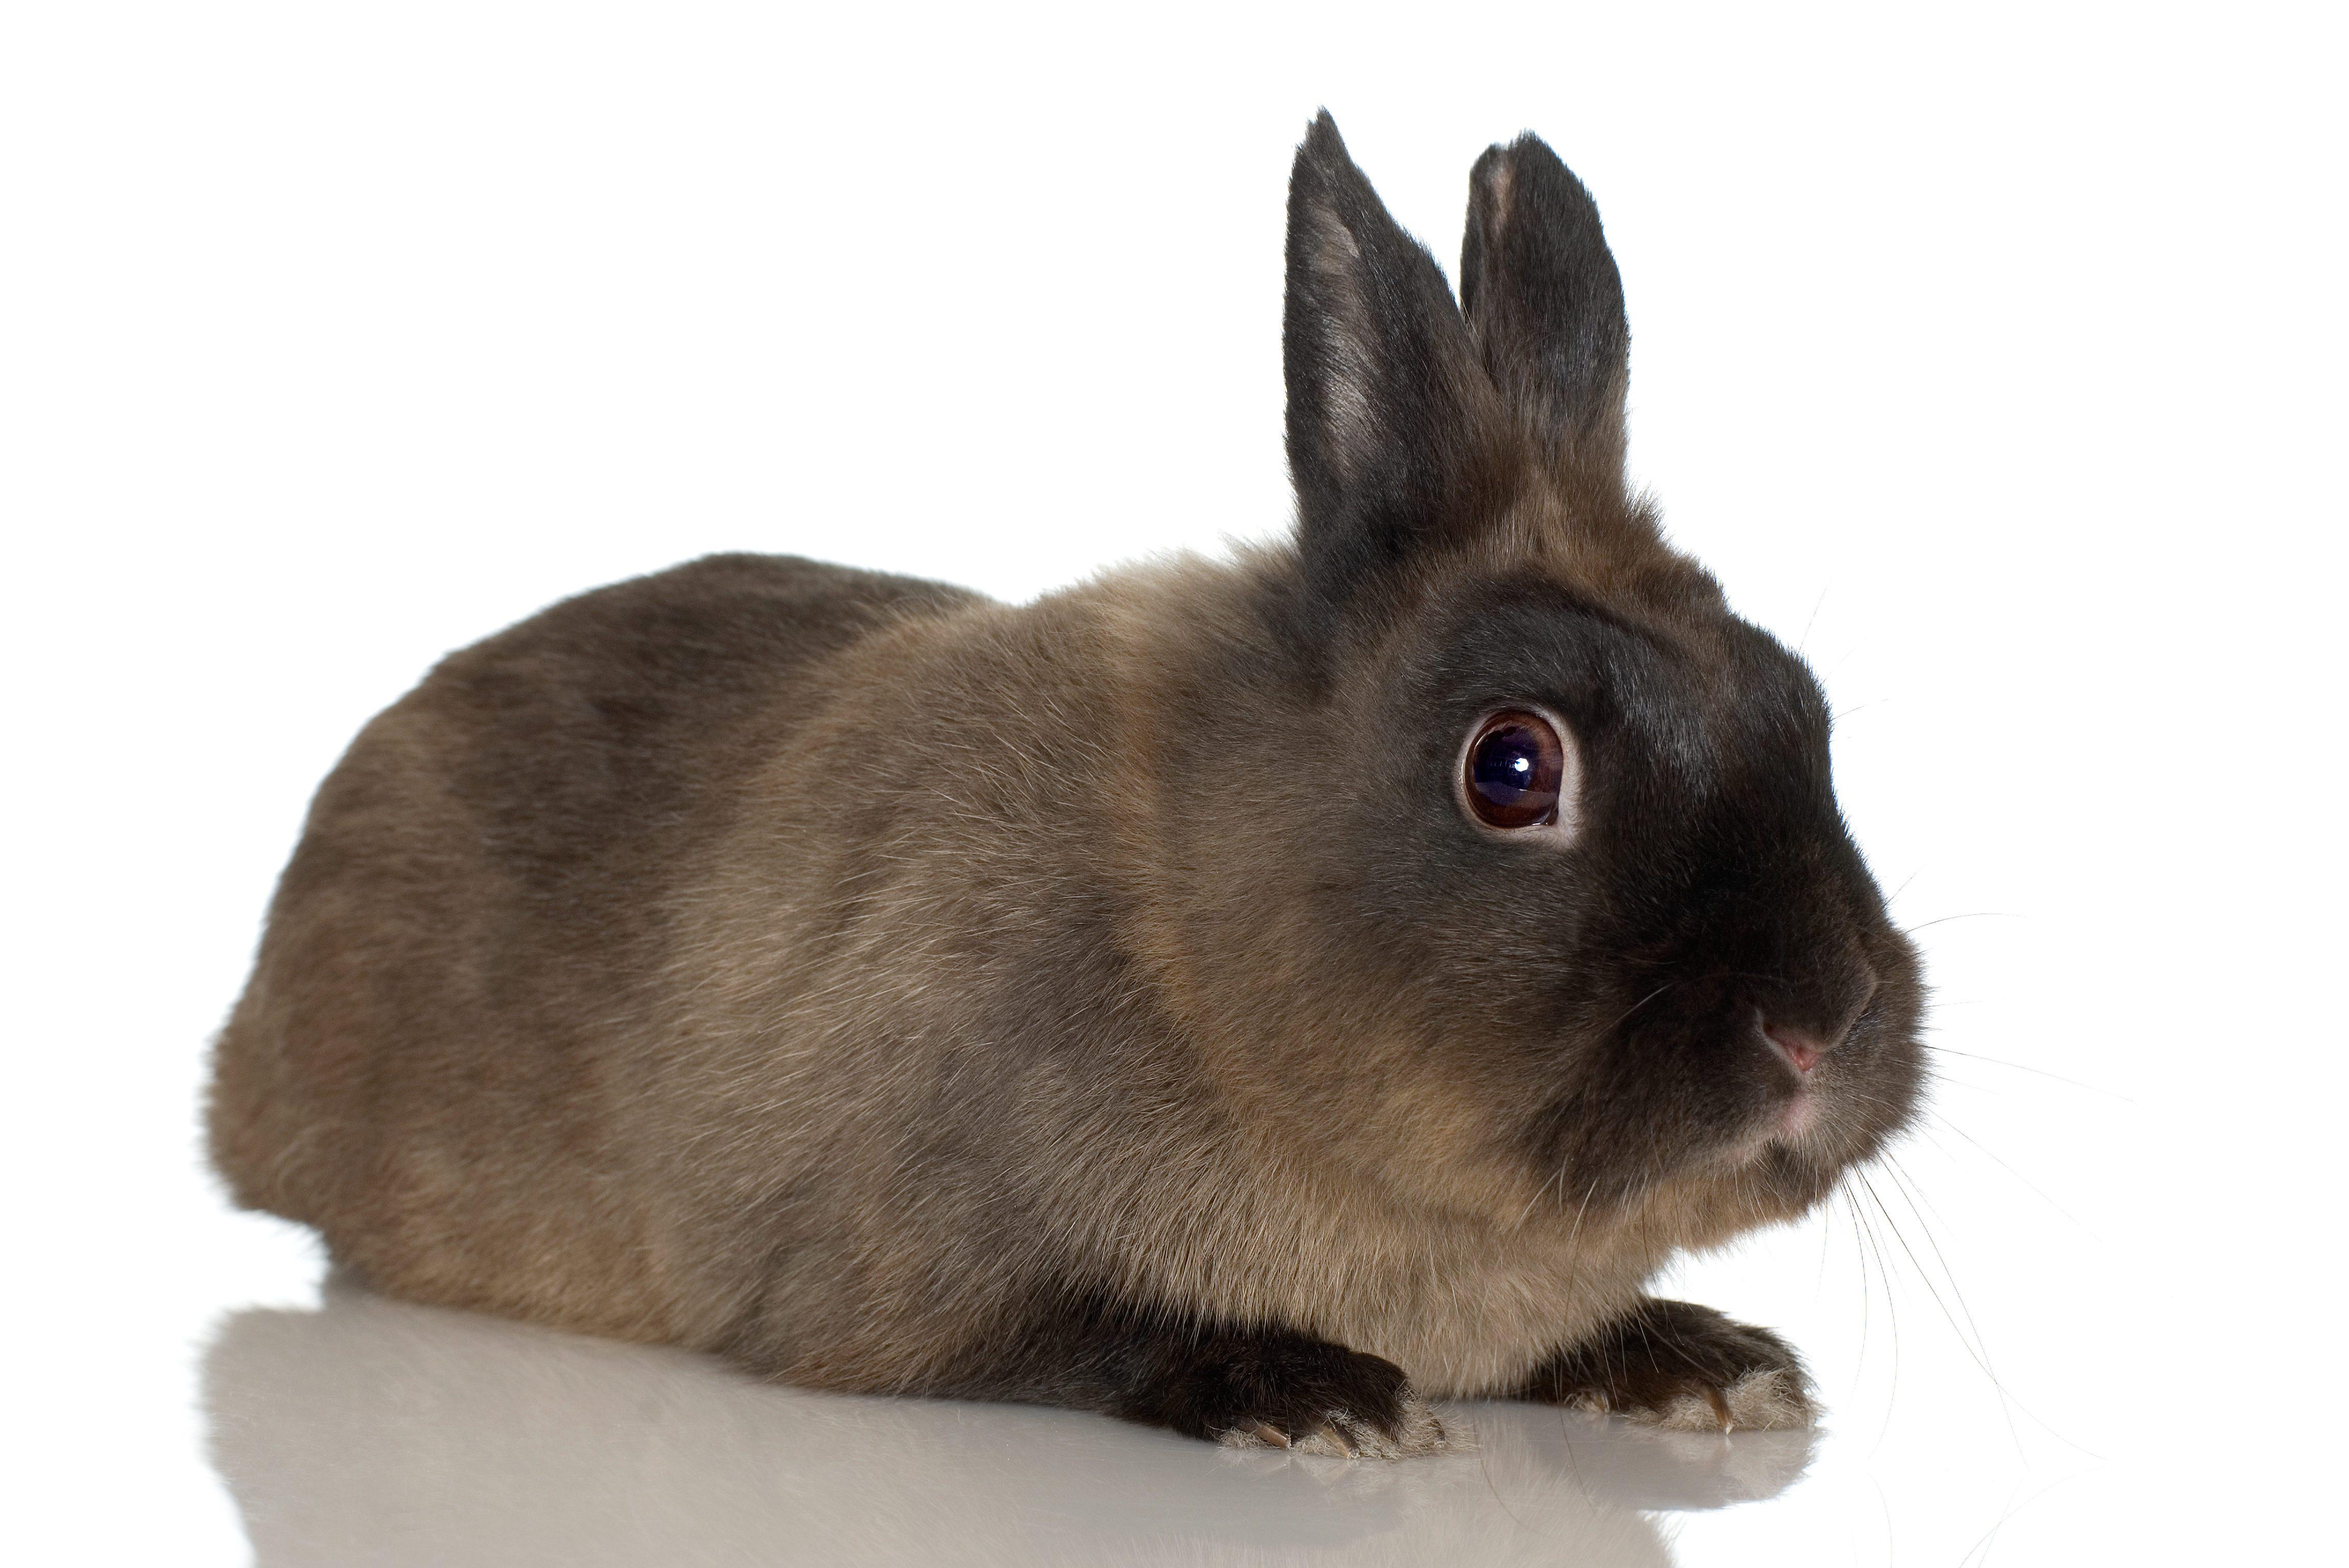 Studio portrait of Himalayan rabbit